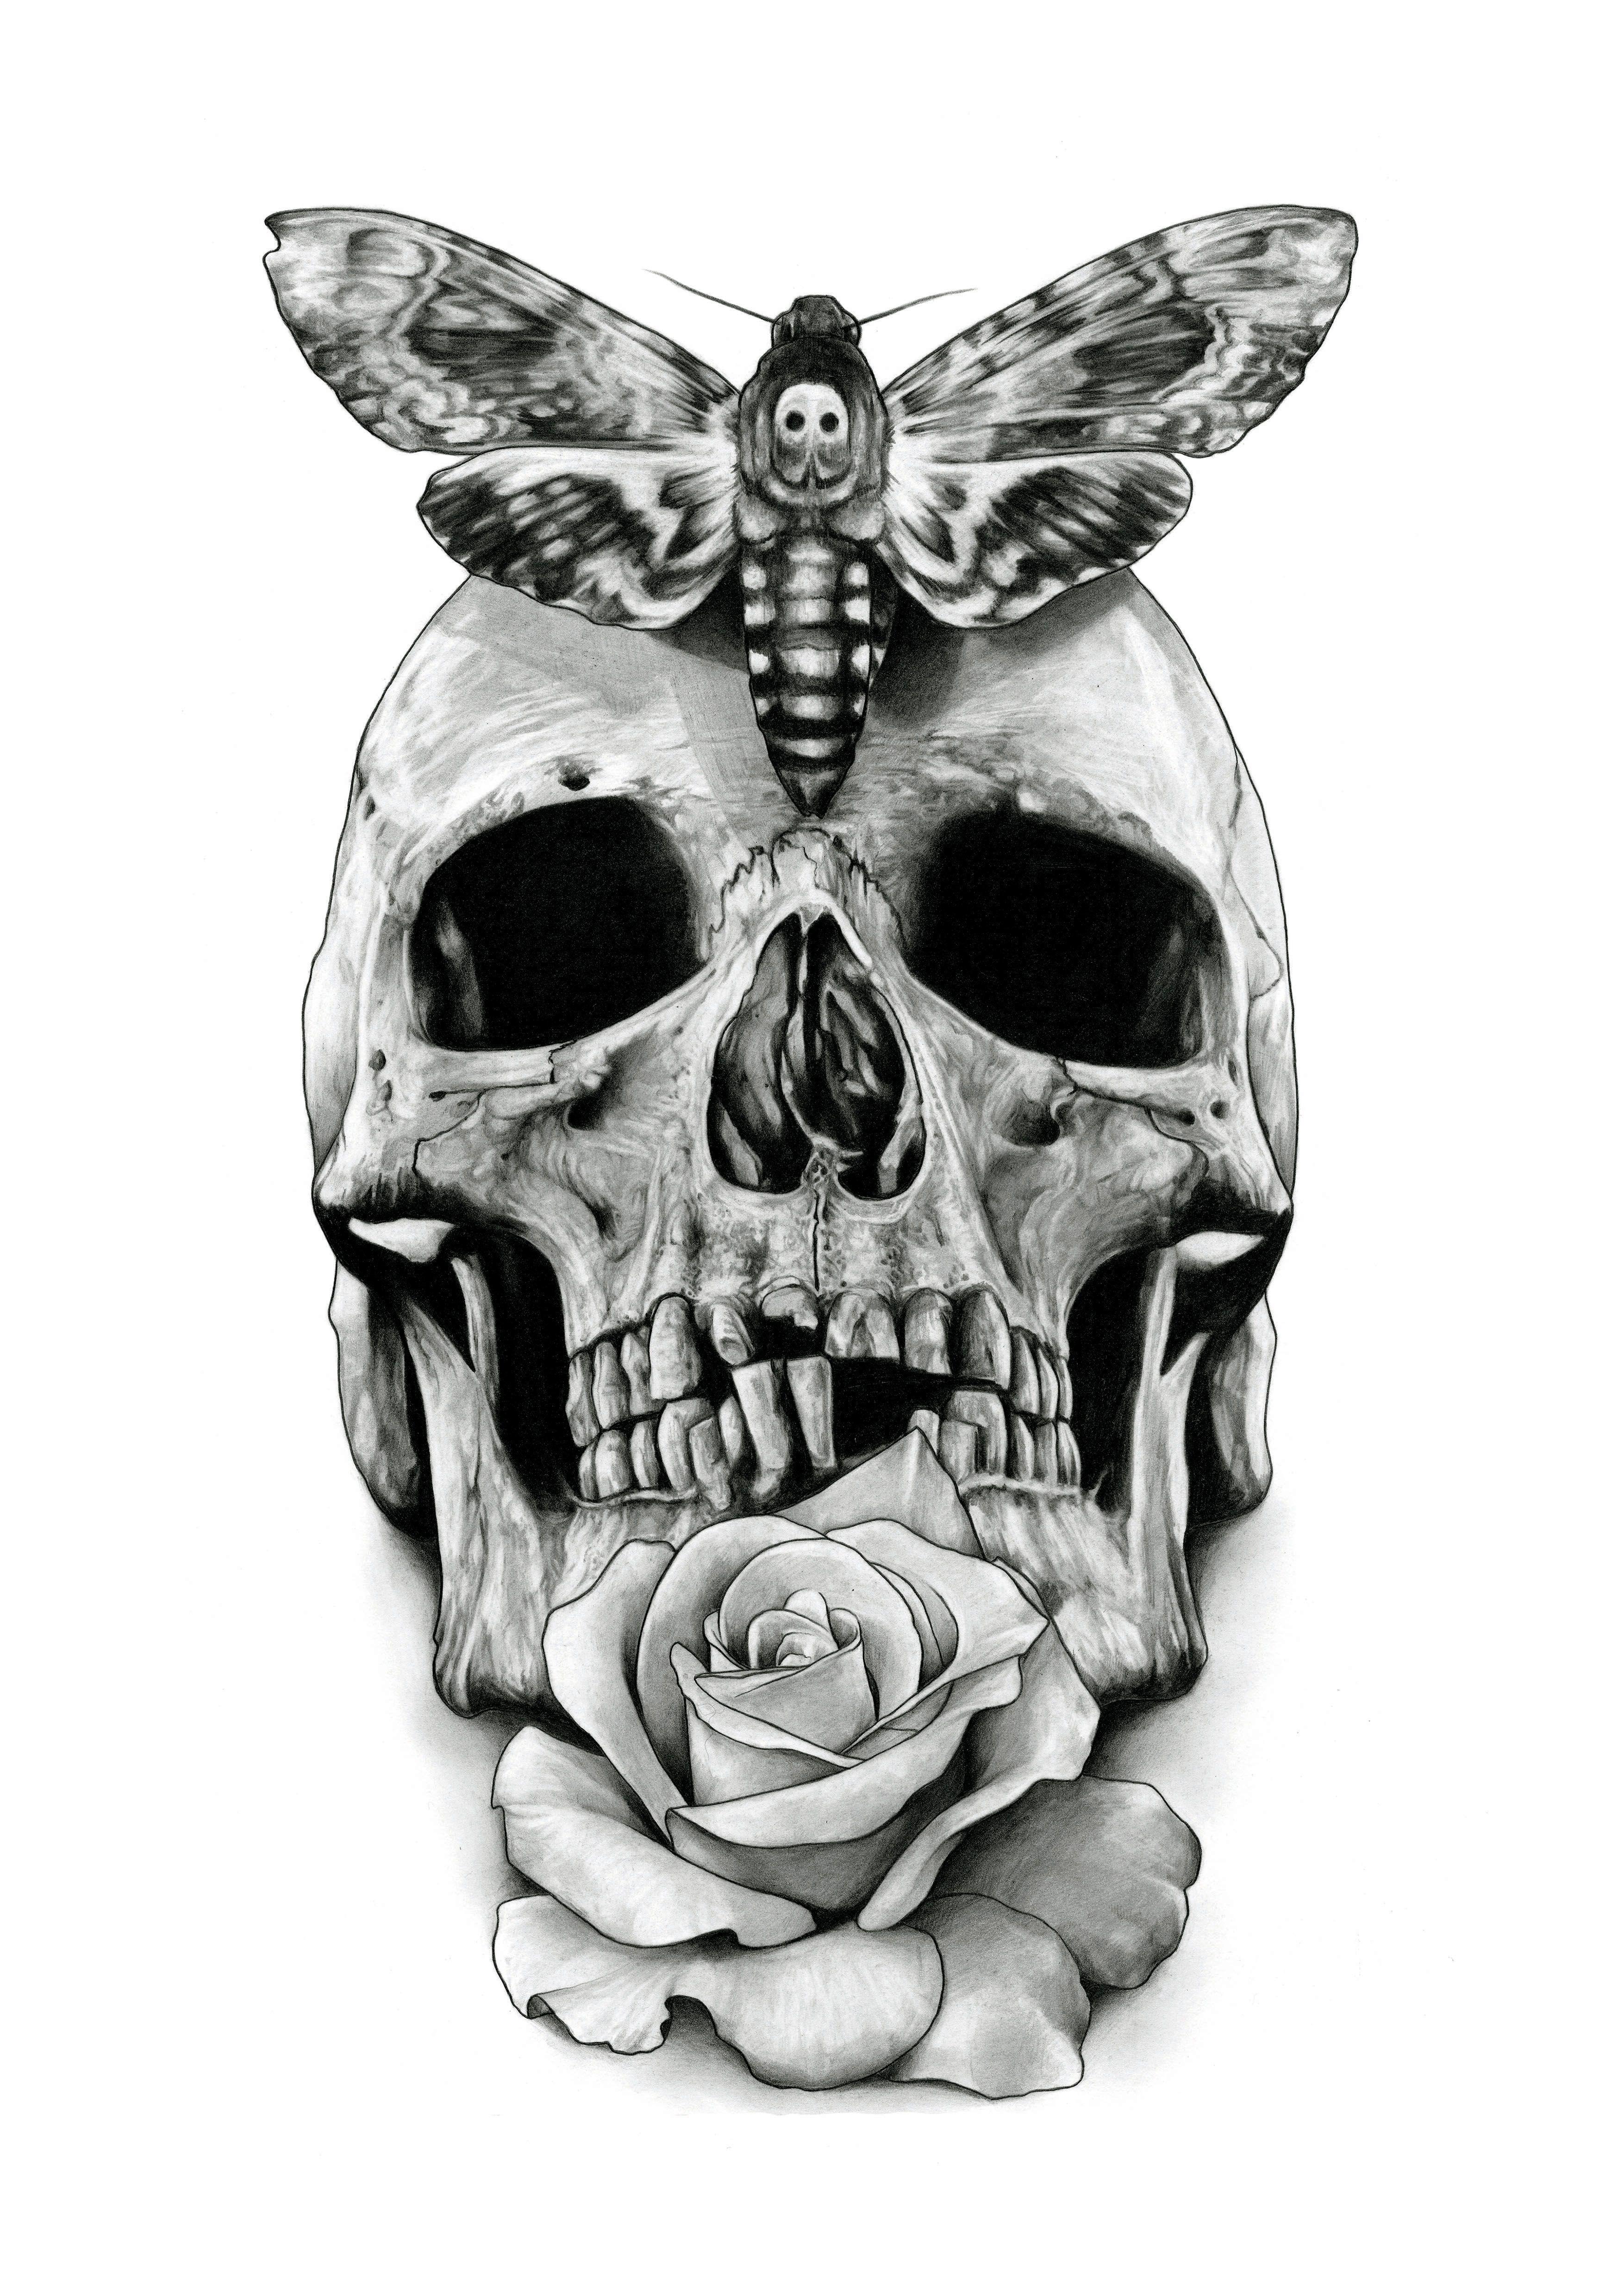 Skull Tattoo Design Drawing By Aaronkingillustrator Tattoos That I